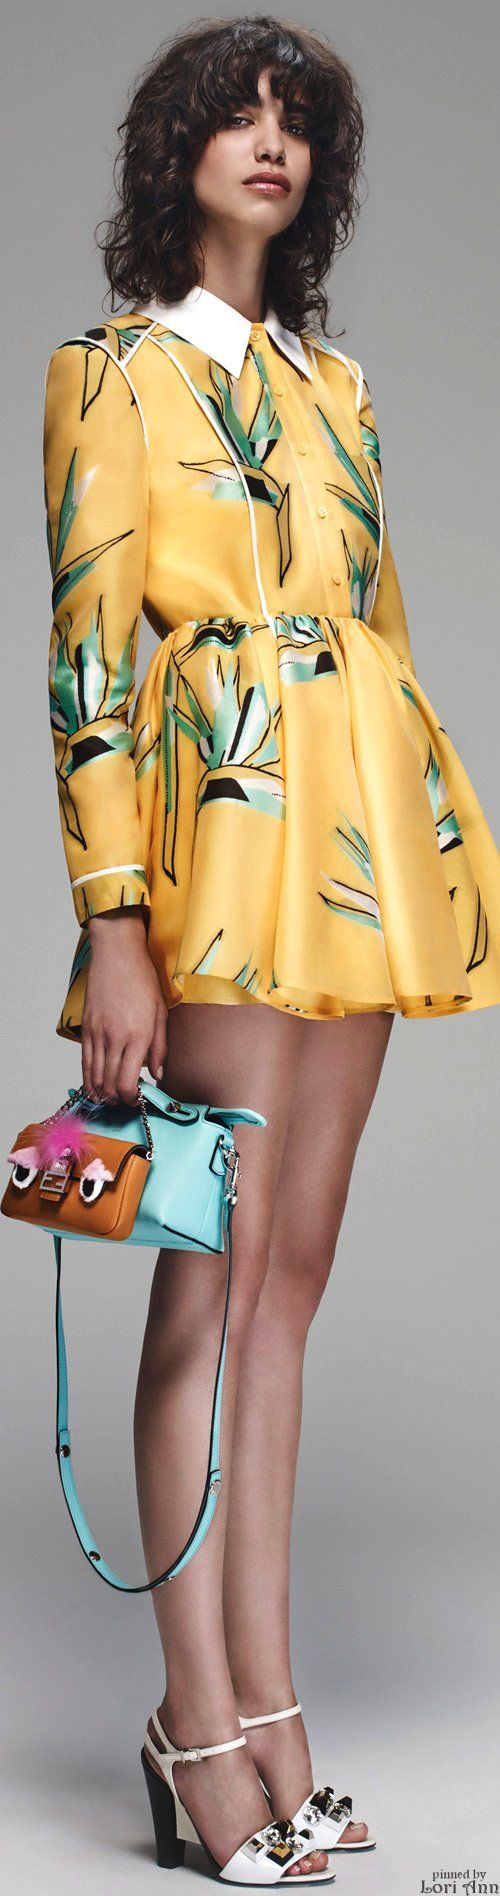 Fendi Resort 2016 women fashion outfit clothing style apparel @roressclothes closet ideas